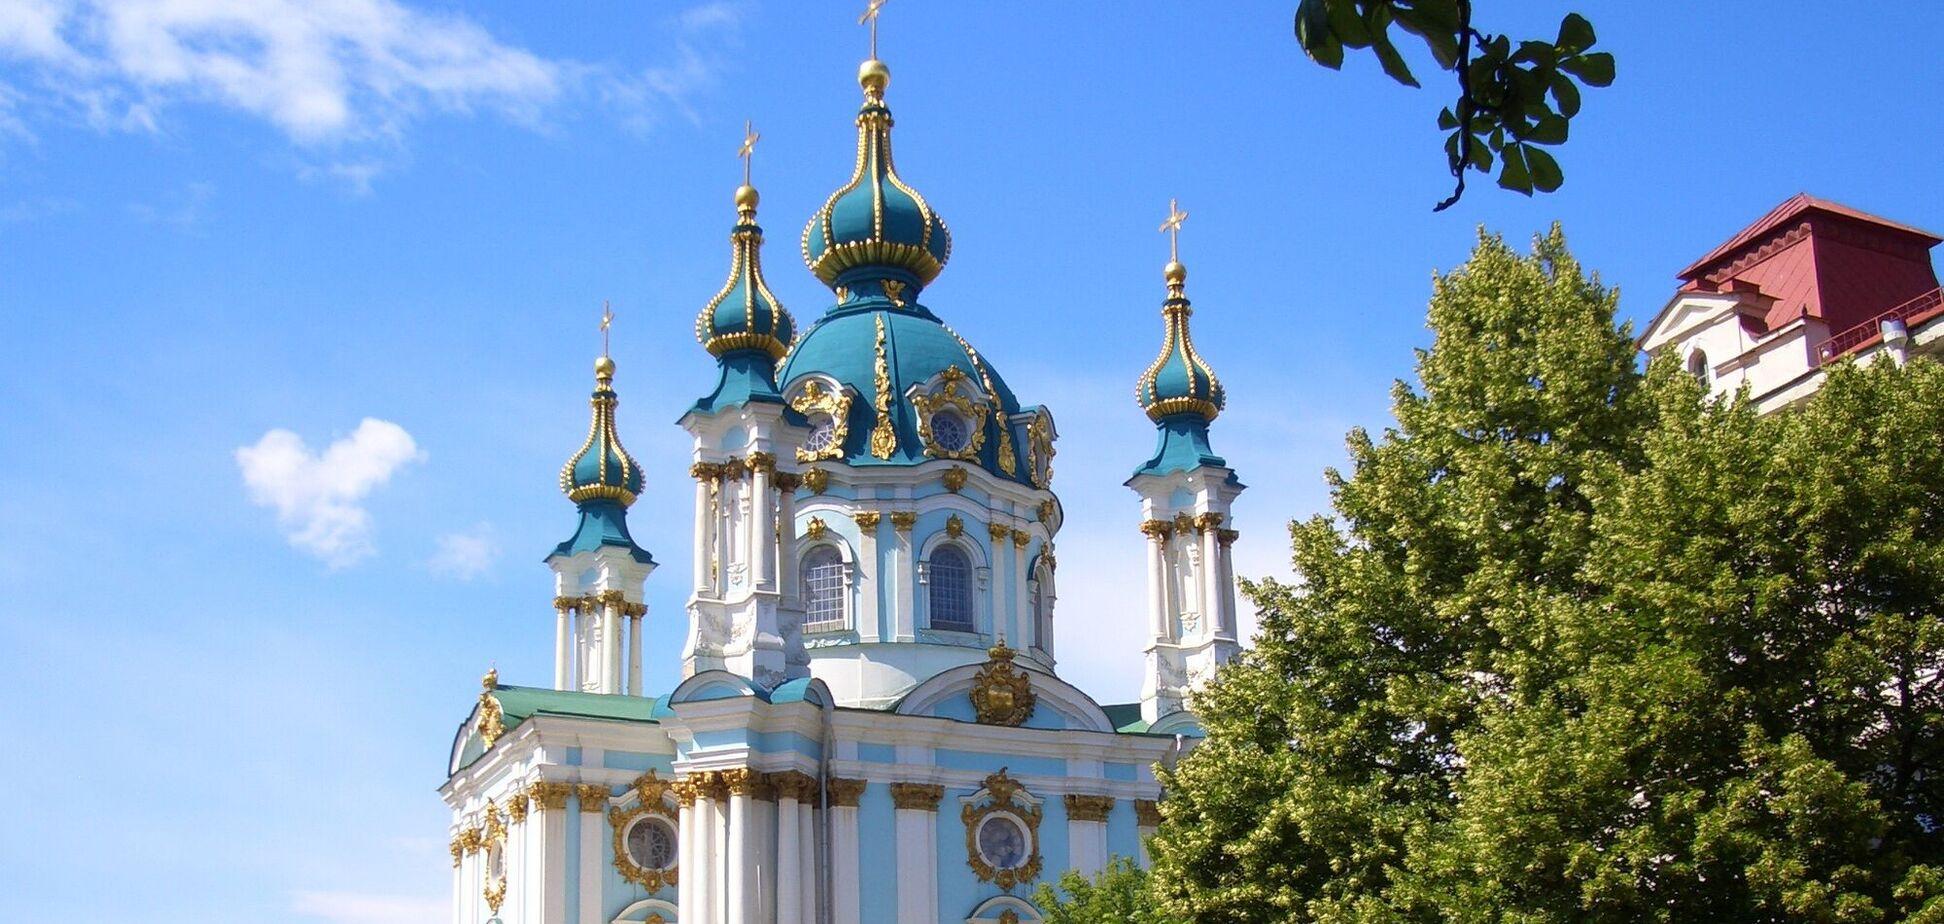 Киев покинет жара и дожди: синоптики озвучили прогноз до конца недели